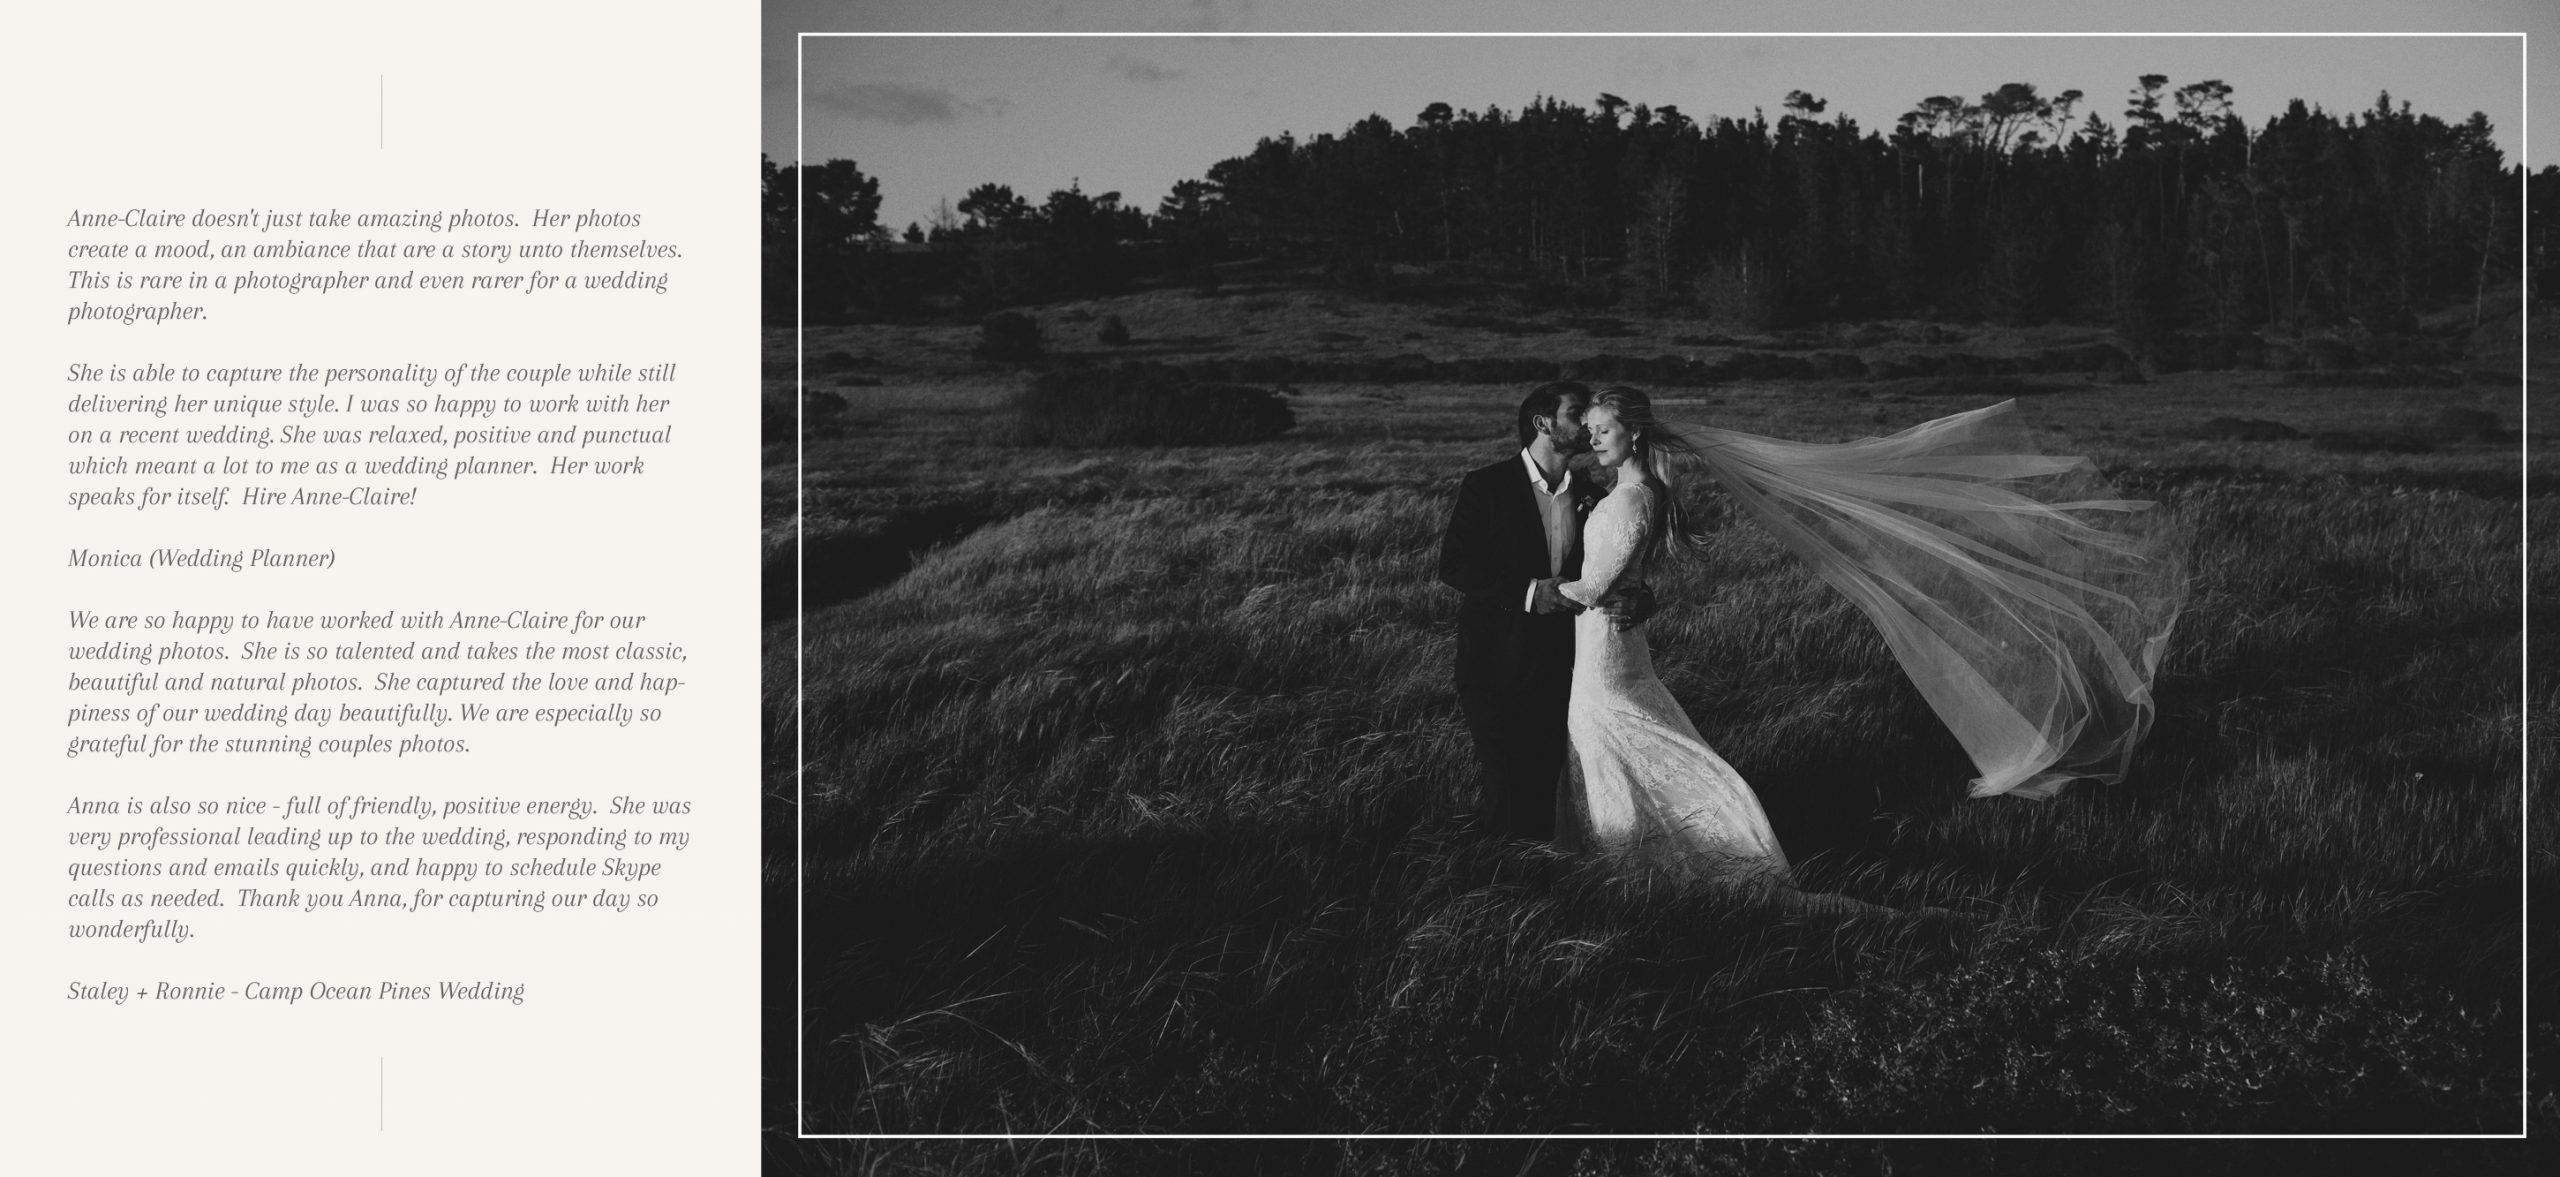 Camp Ocean Pines Wedding